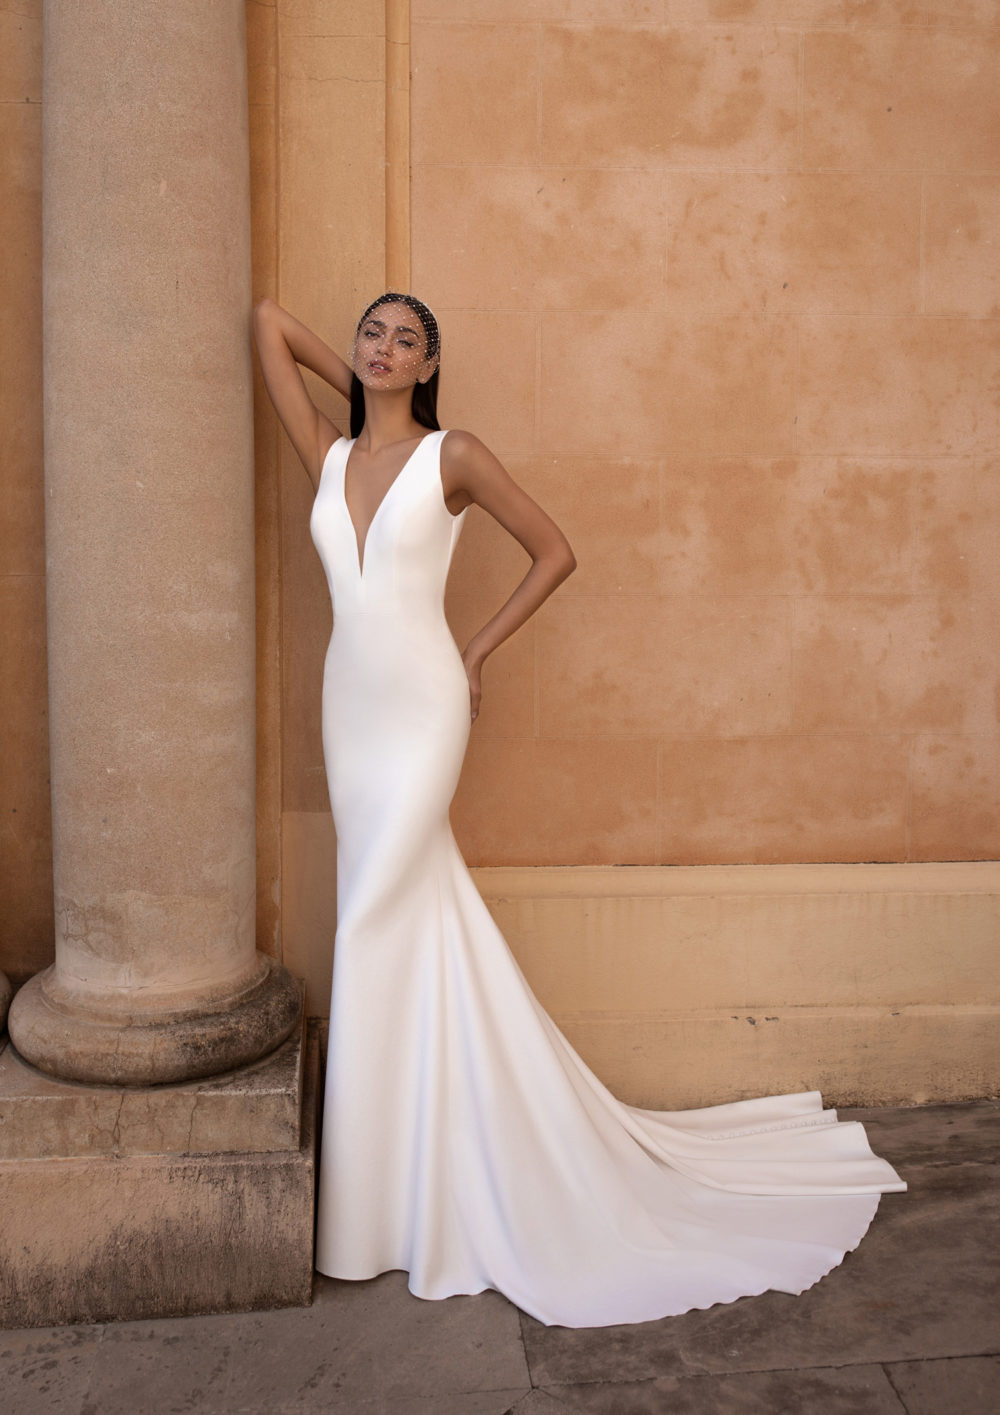 Mariages: abito da sposa Pronovias 2020 a Vicenza, Verona, Padova, Veneto EUREKA